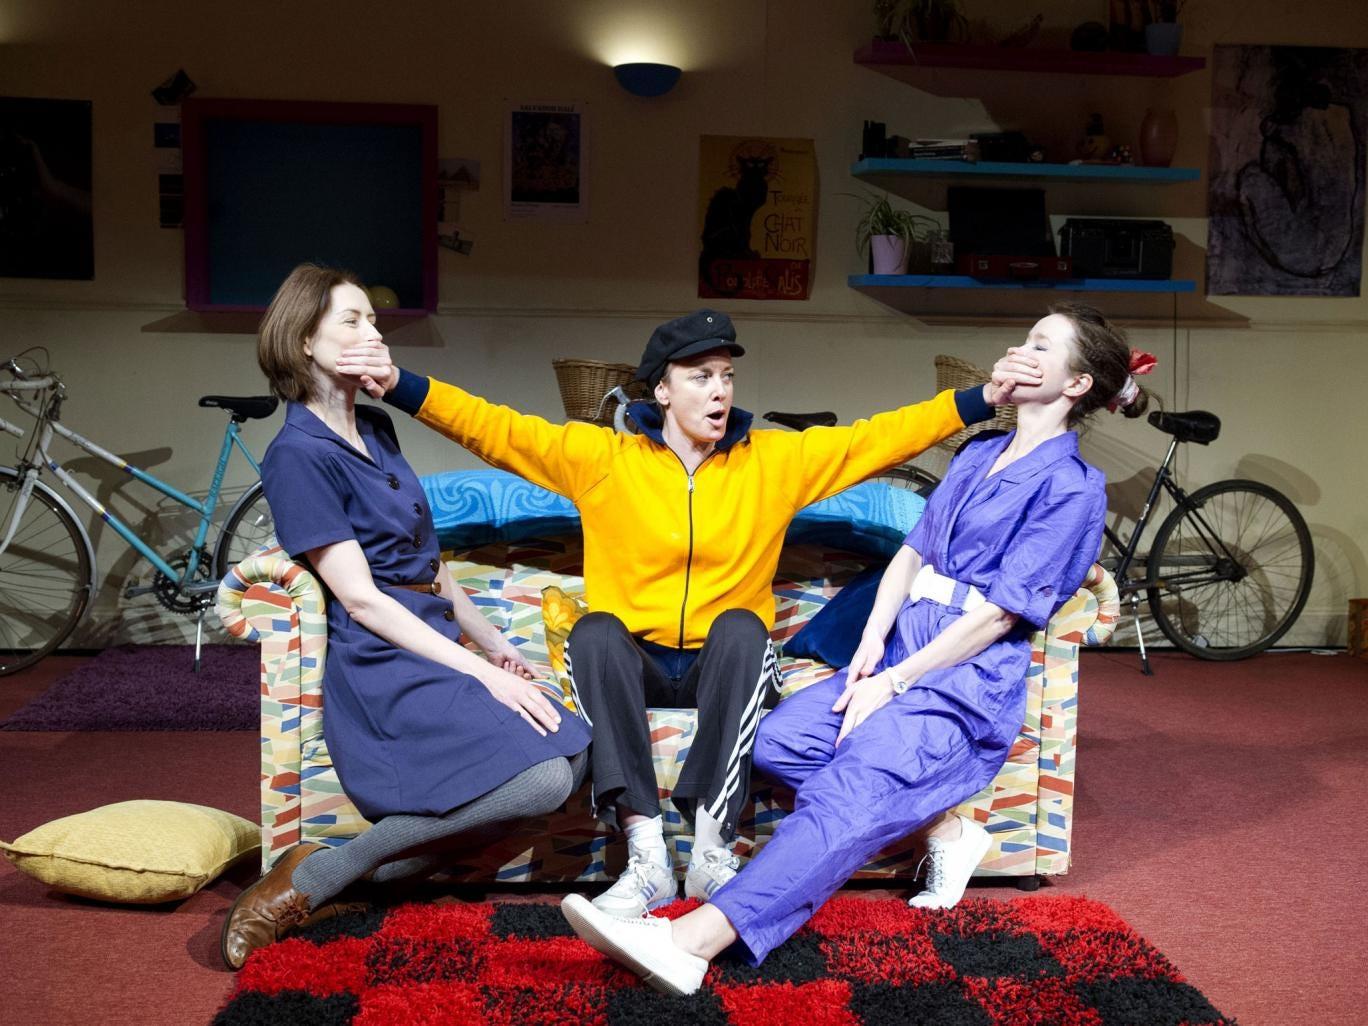 Speak no evil: Gina McKee, Tamzin Outhwaite and Anna Maxwell Martin